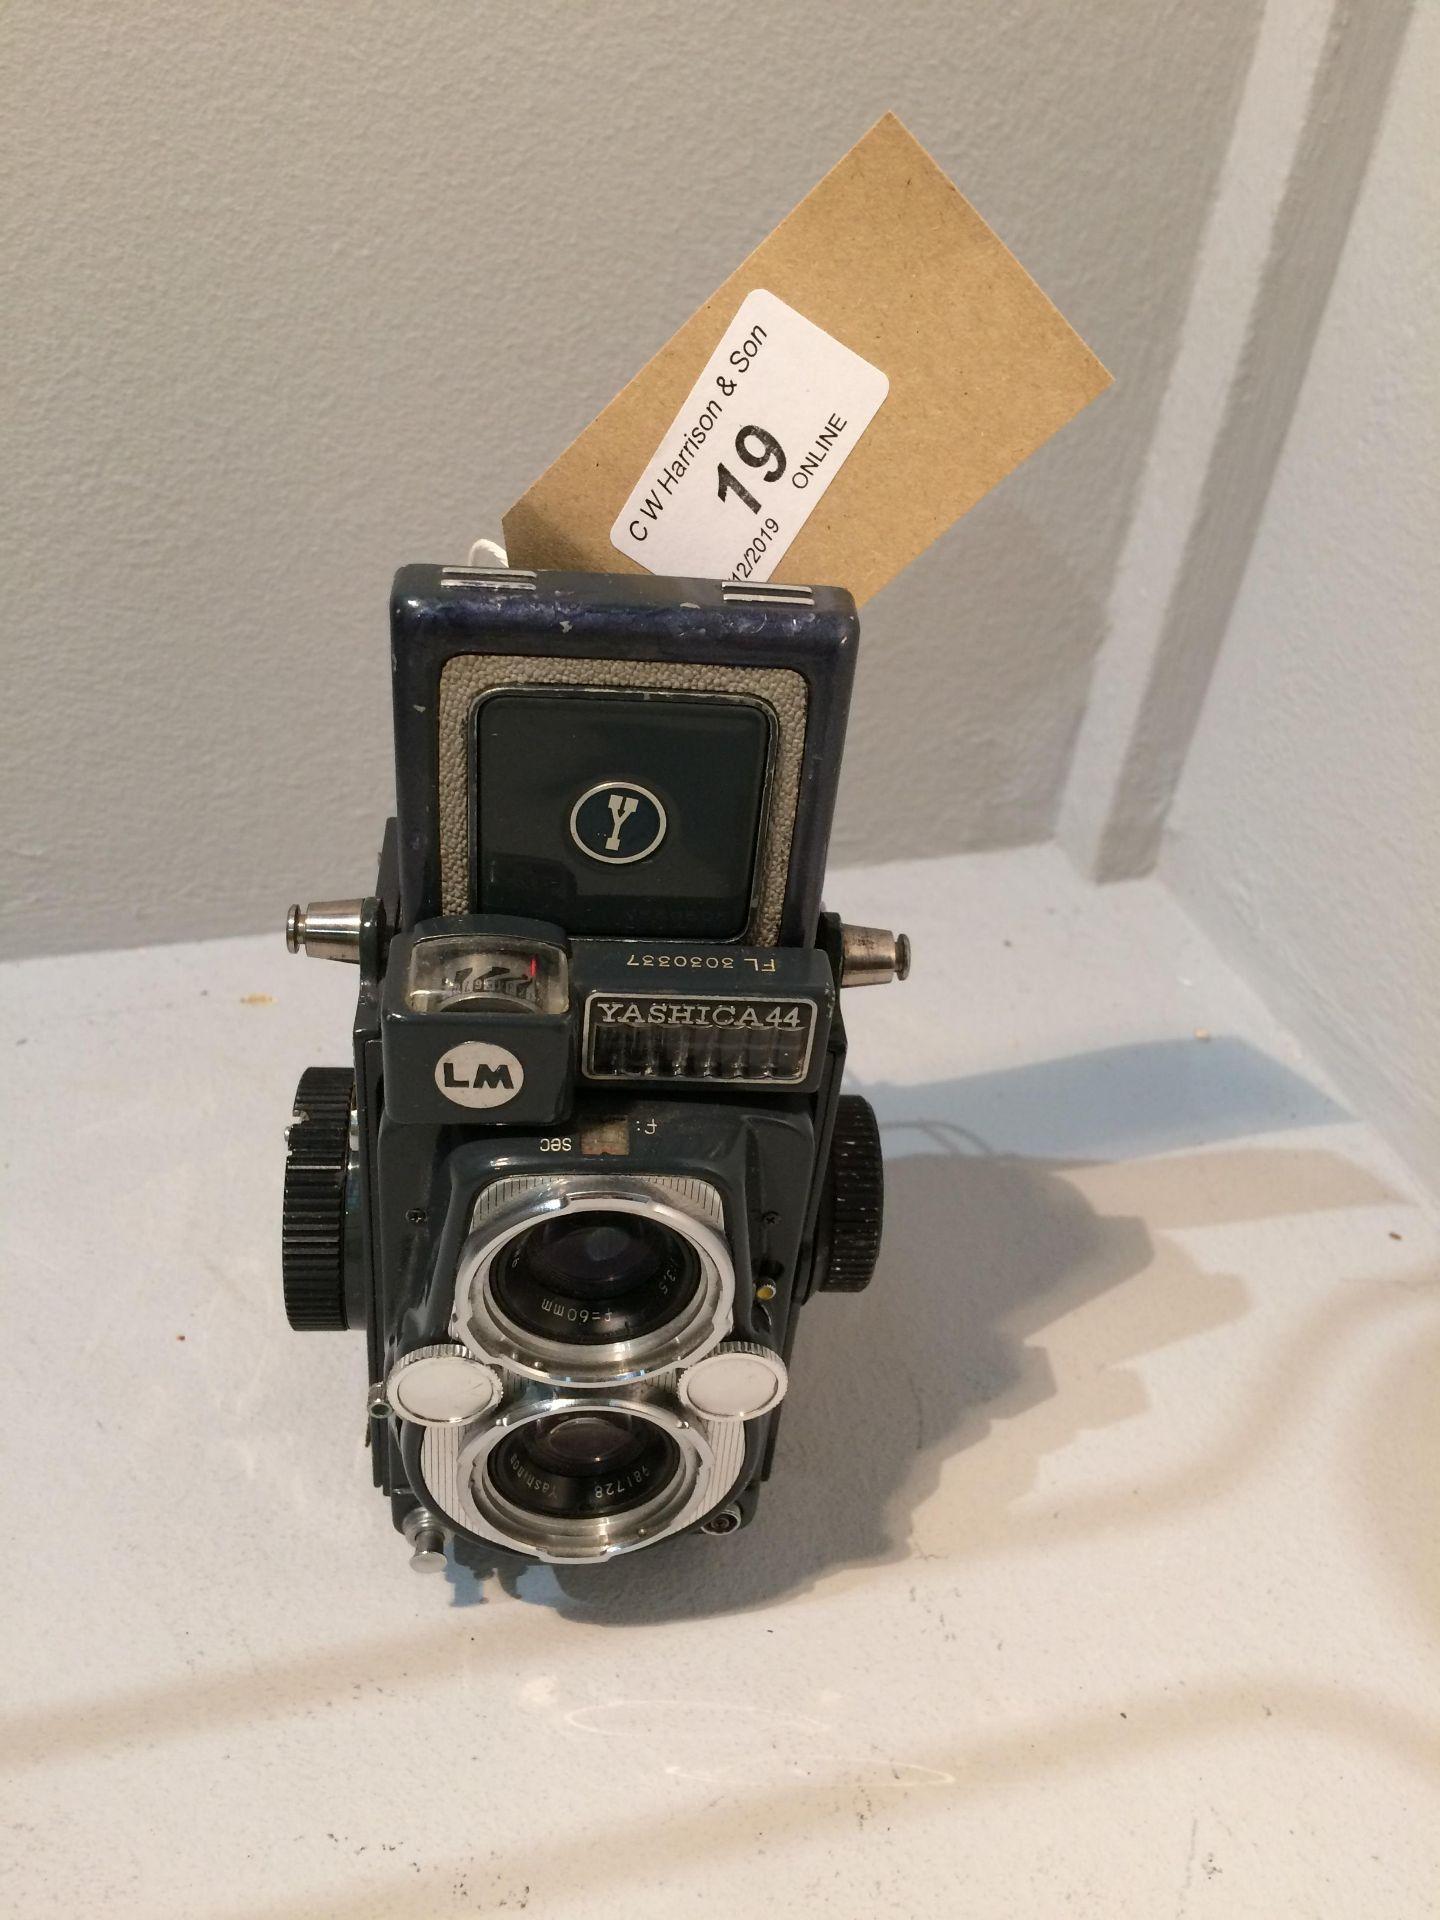 Lot 19 - Yashica - 44 Copal SV camera with Yashinon 1..3.